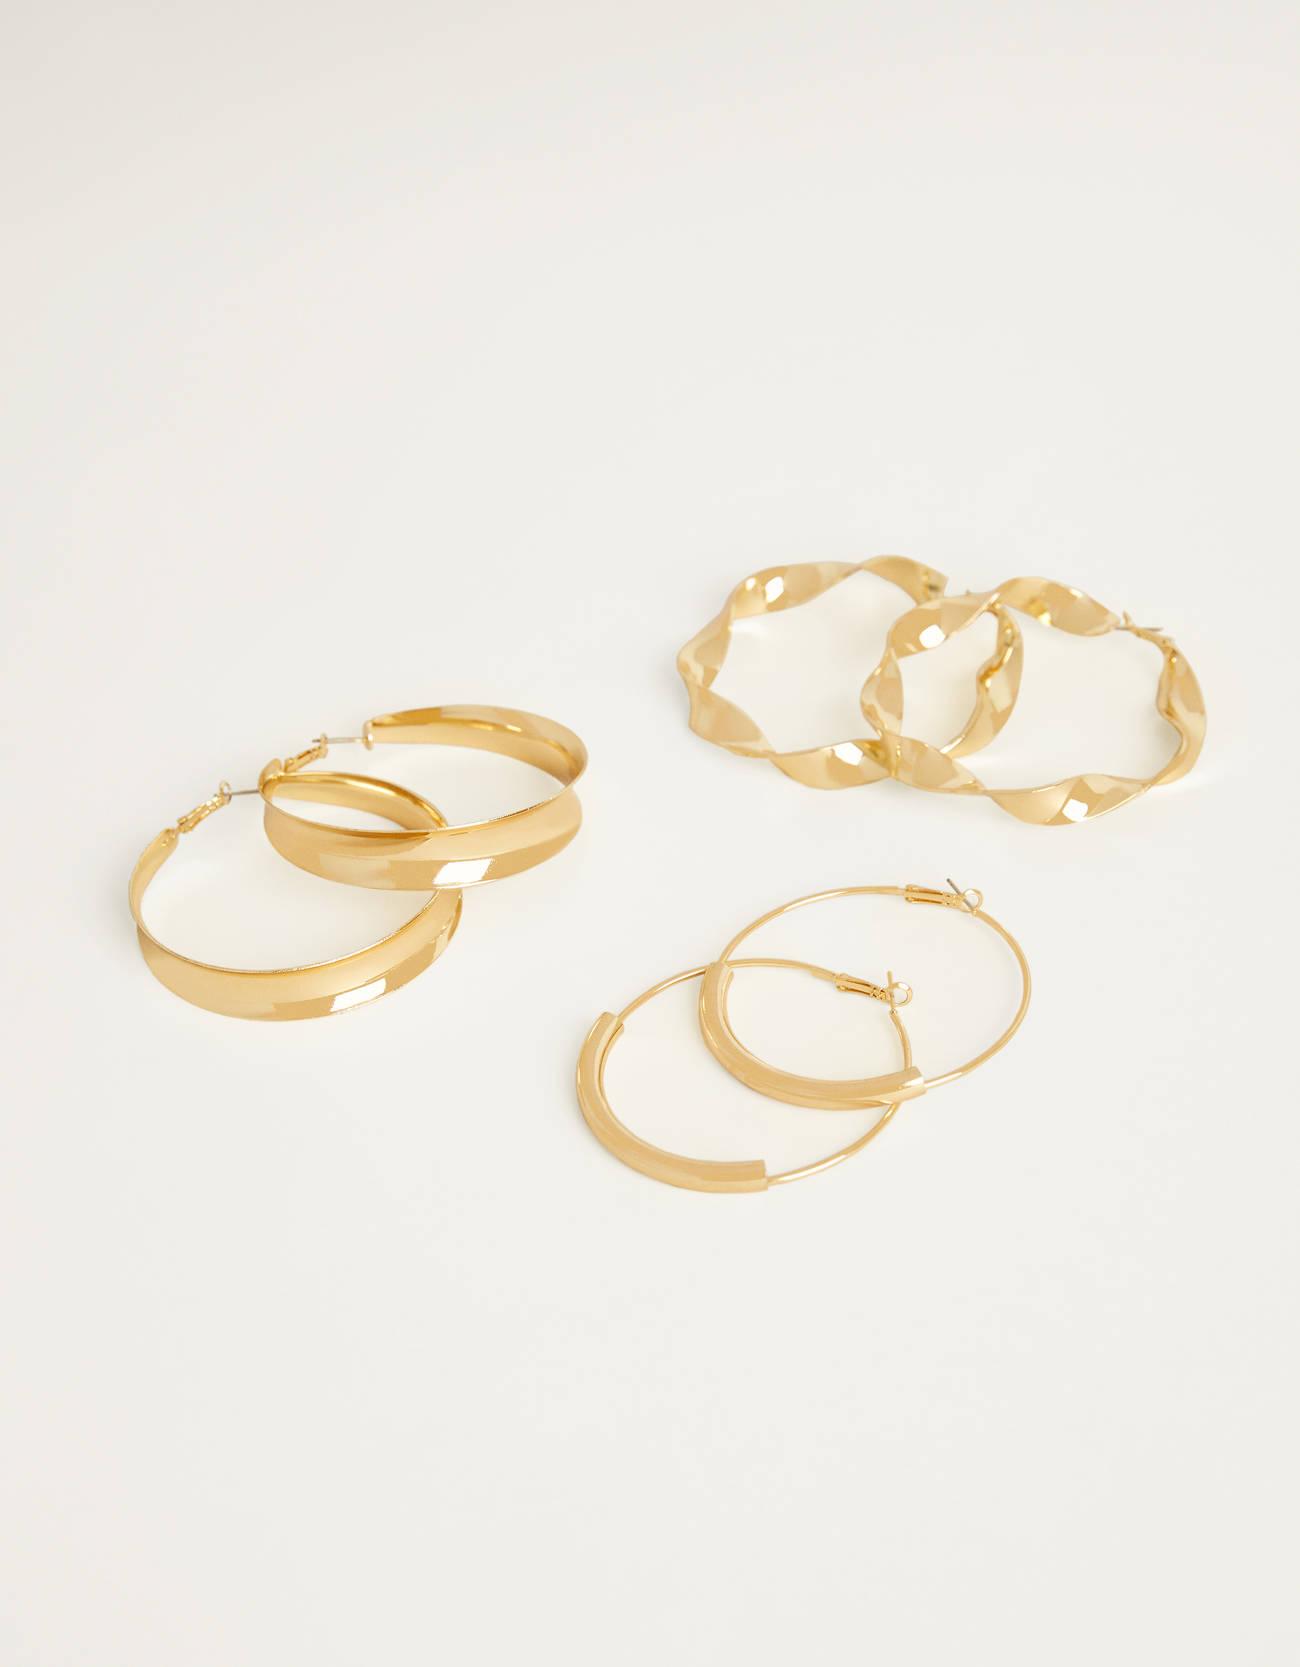 Set de tres aros XL dorados